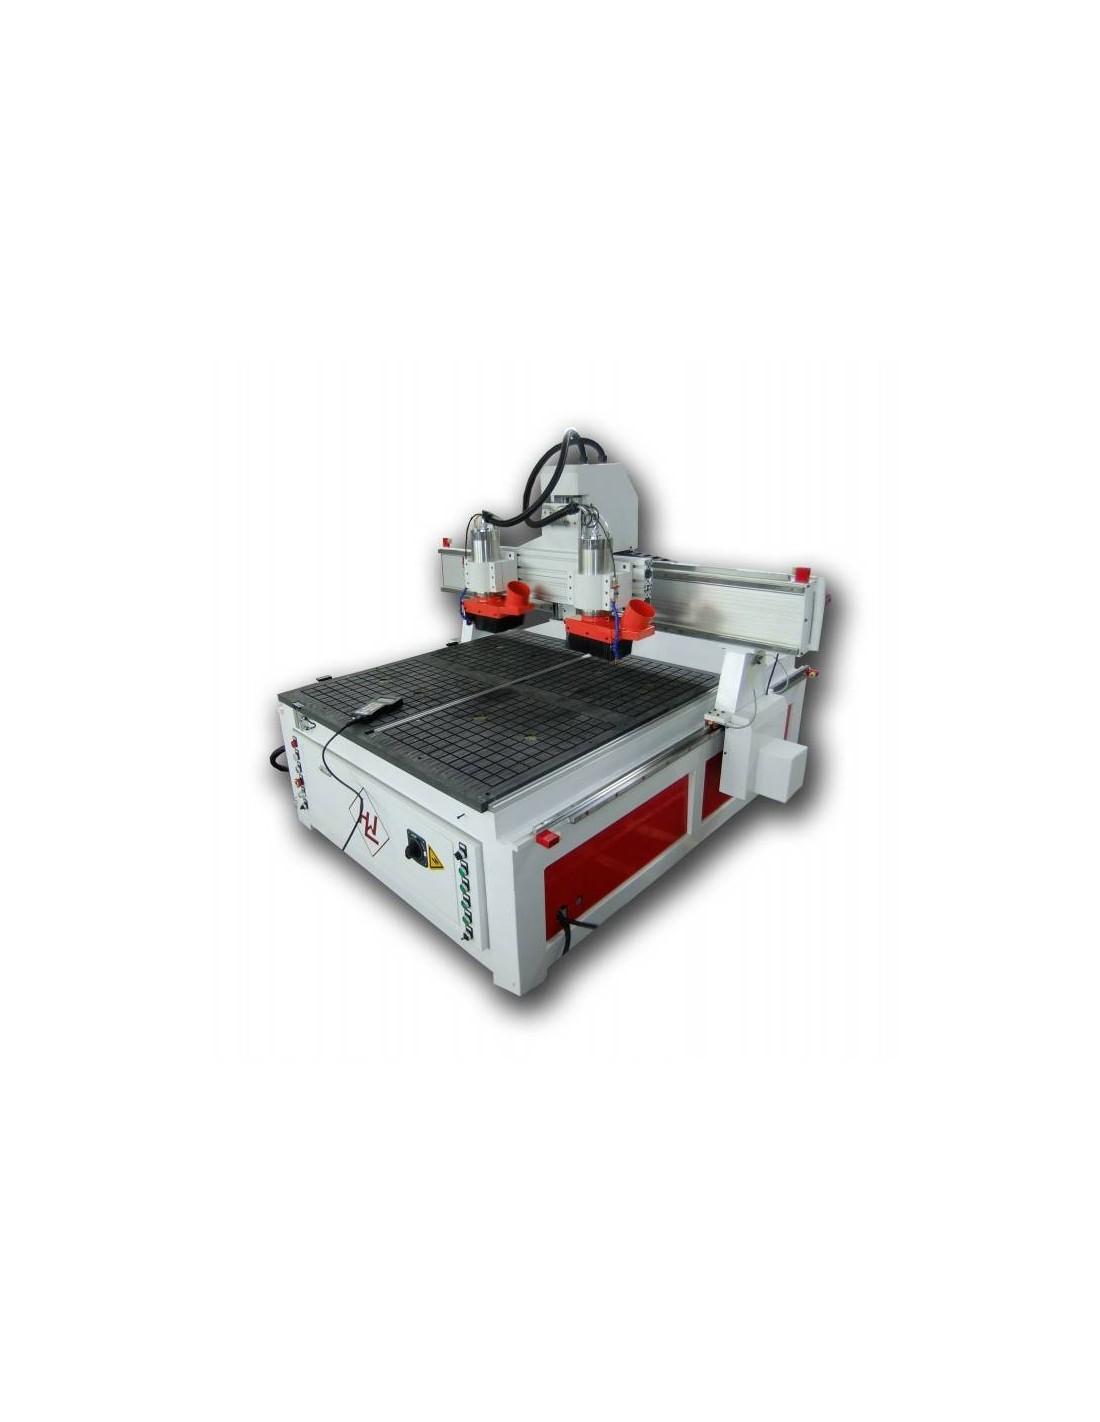 Masina de frezat si gravat CNC Winter RouterMax 1313 Simultane Deluxe